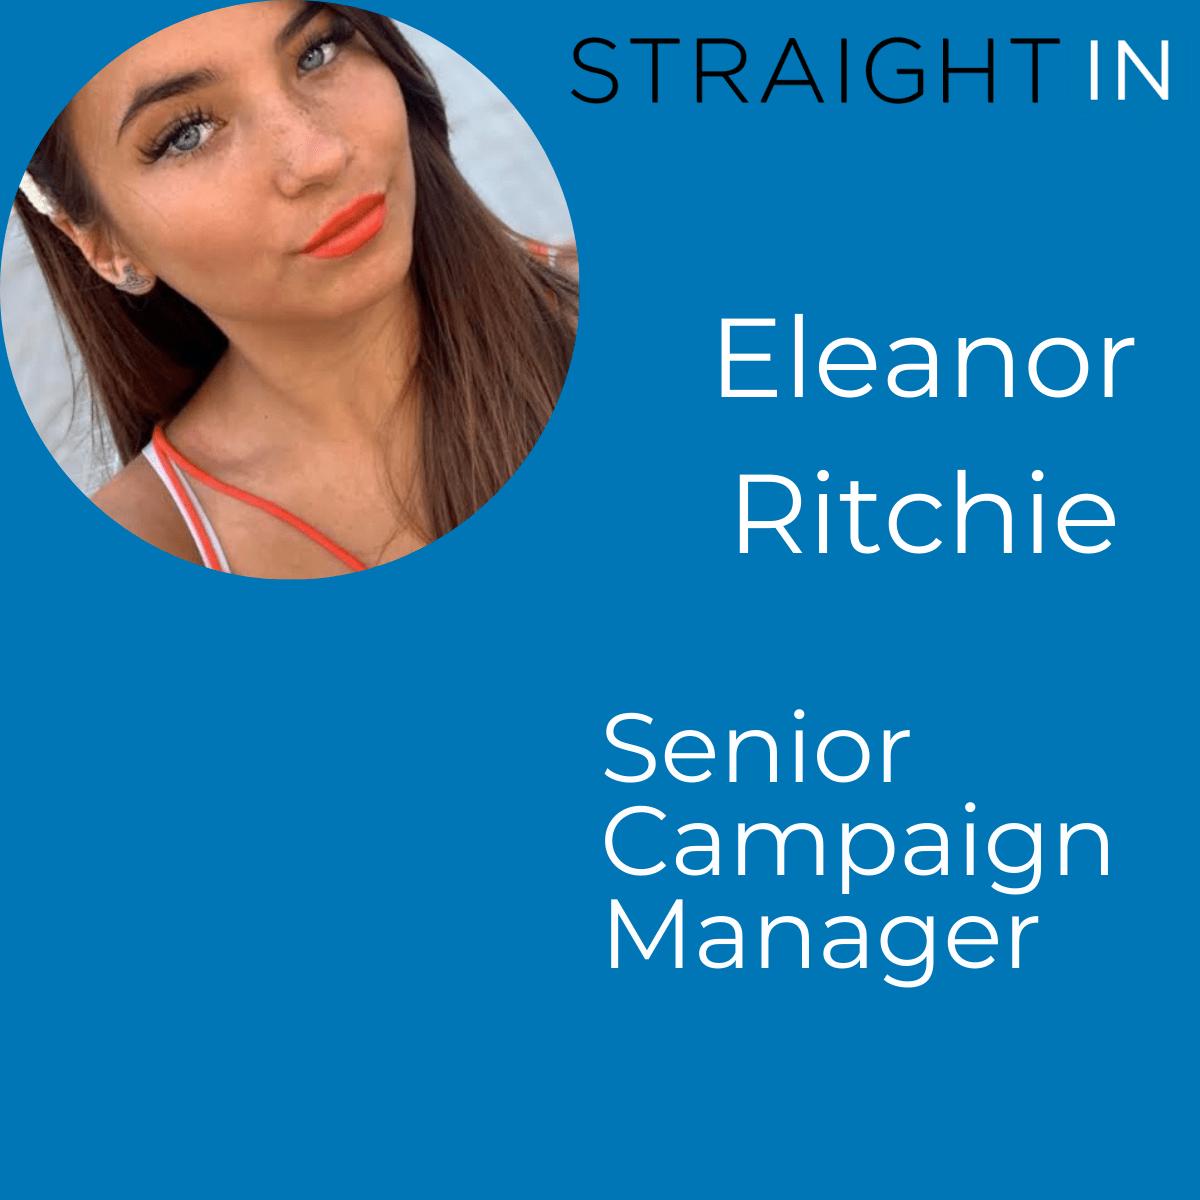 Eleanor Linkedin Lead Generation Straightin